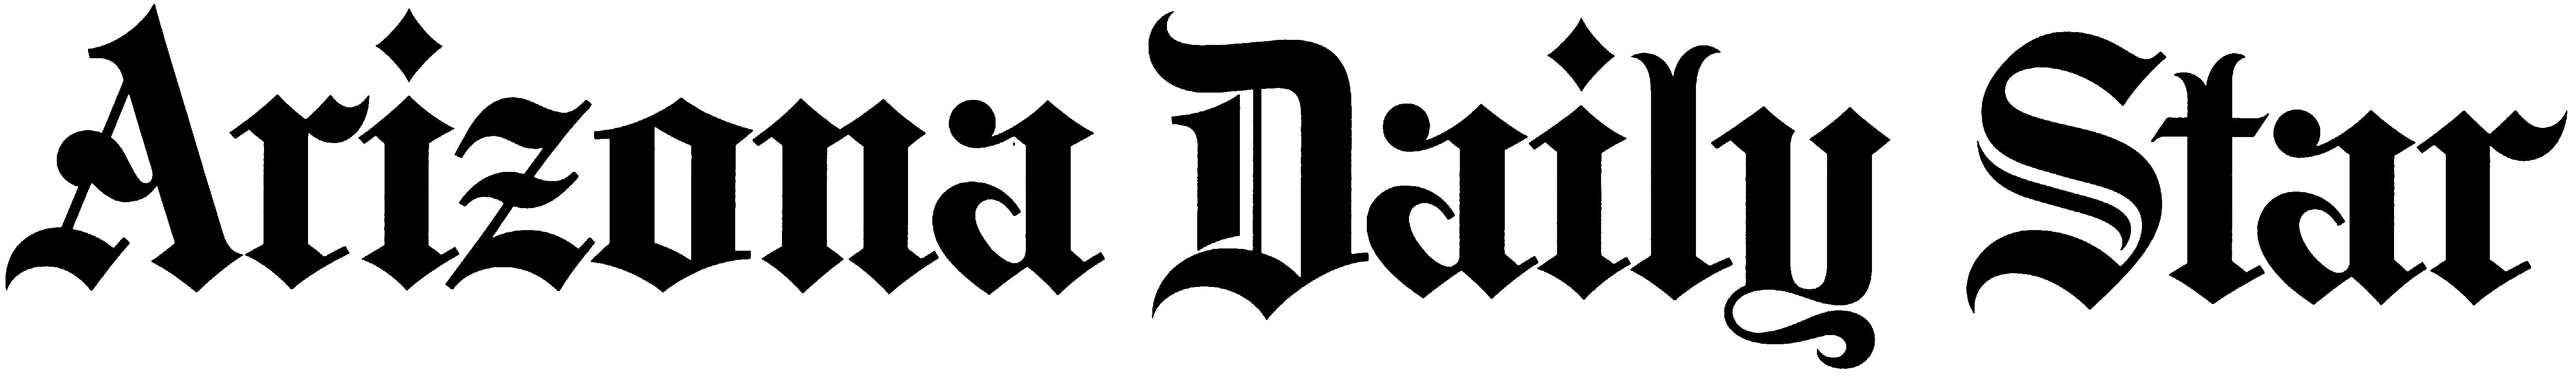 Arizona_Daily_Star.png